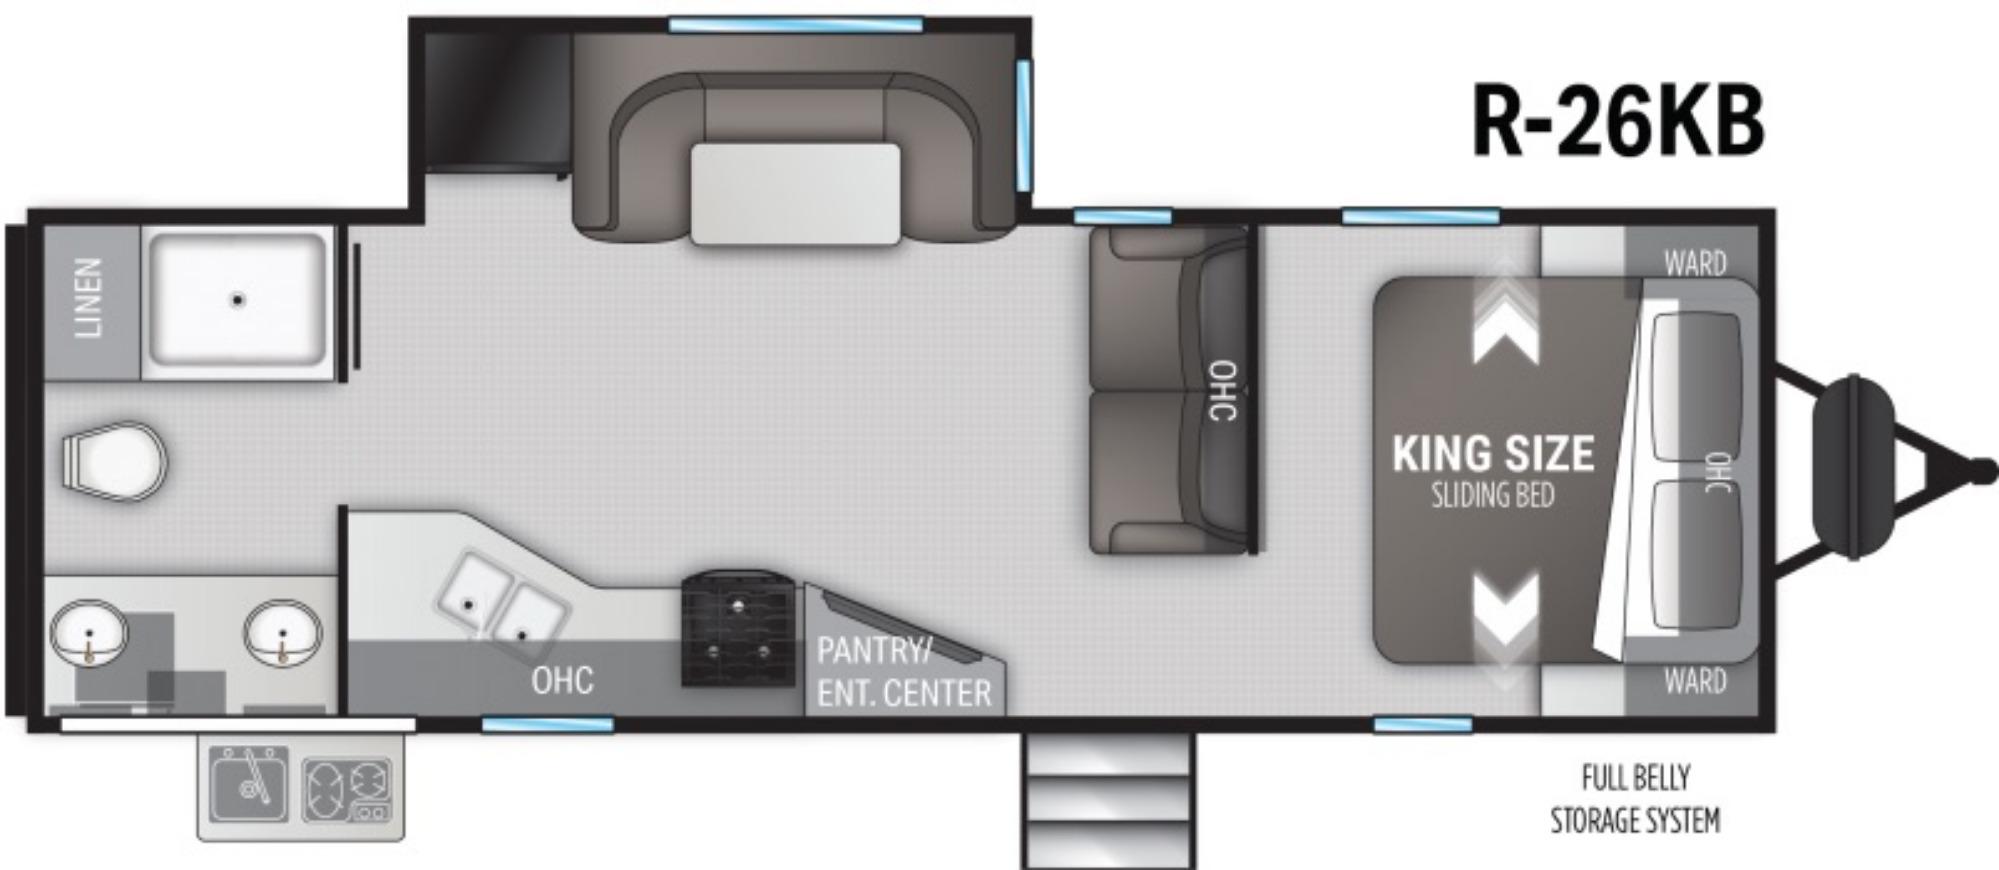 View Floor Plan for 2021 CRUISER RV RADIANCE 26KB